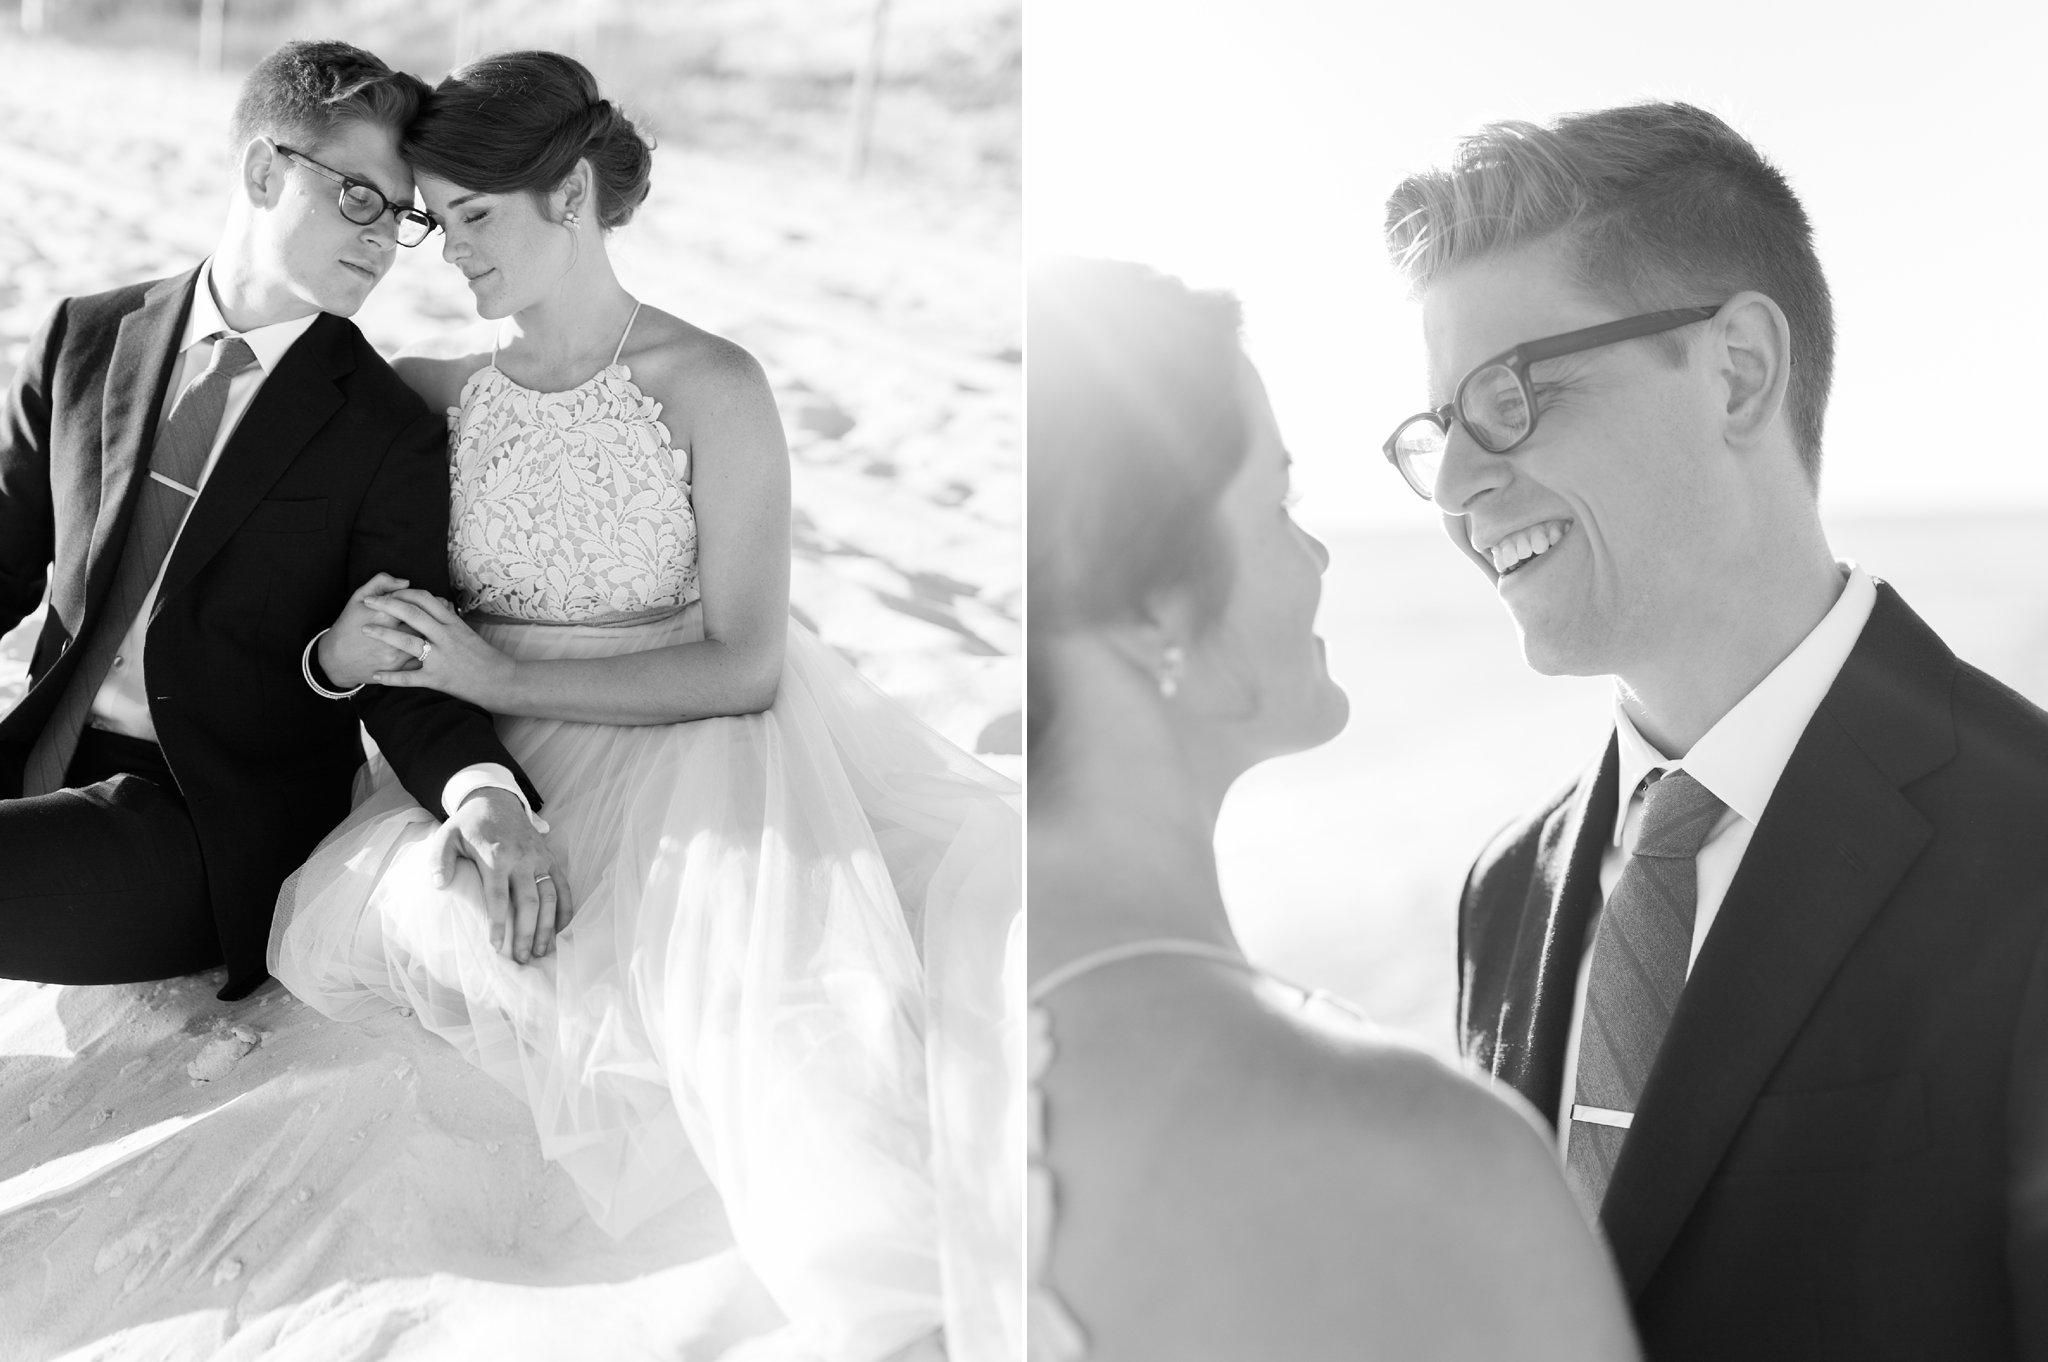 inlet beach wedding 30a wedding inlet beach wedding photographer shannon griffin photography_0019.jpg